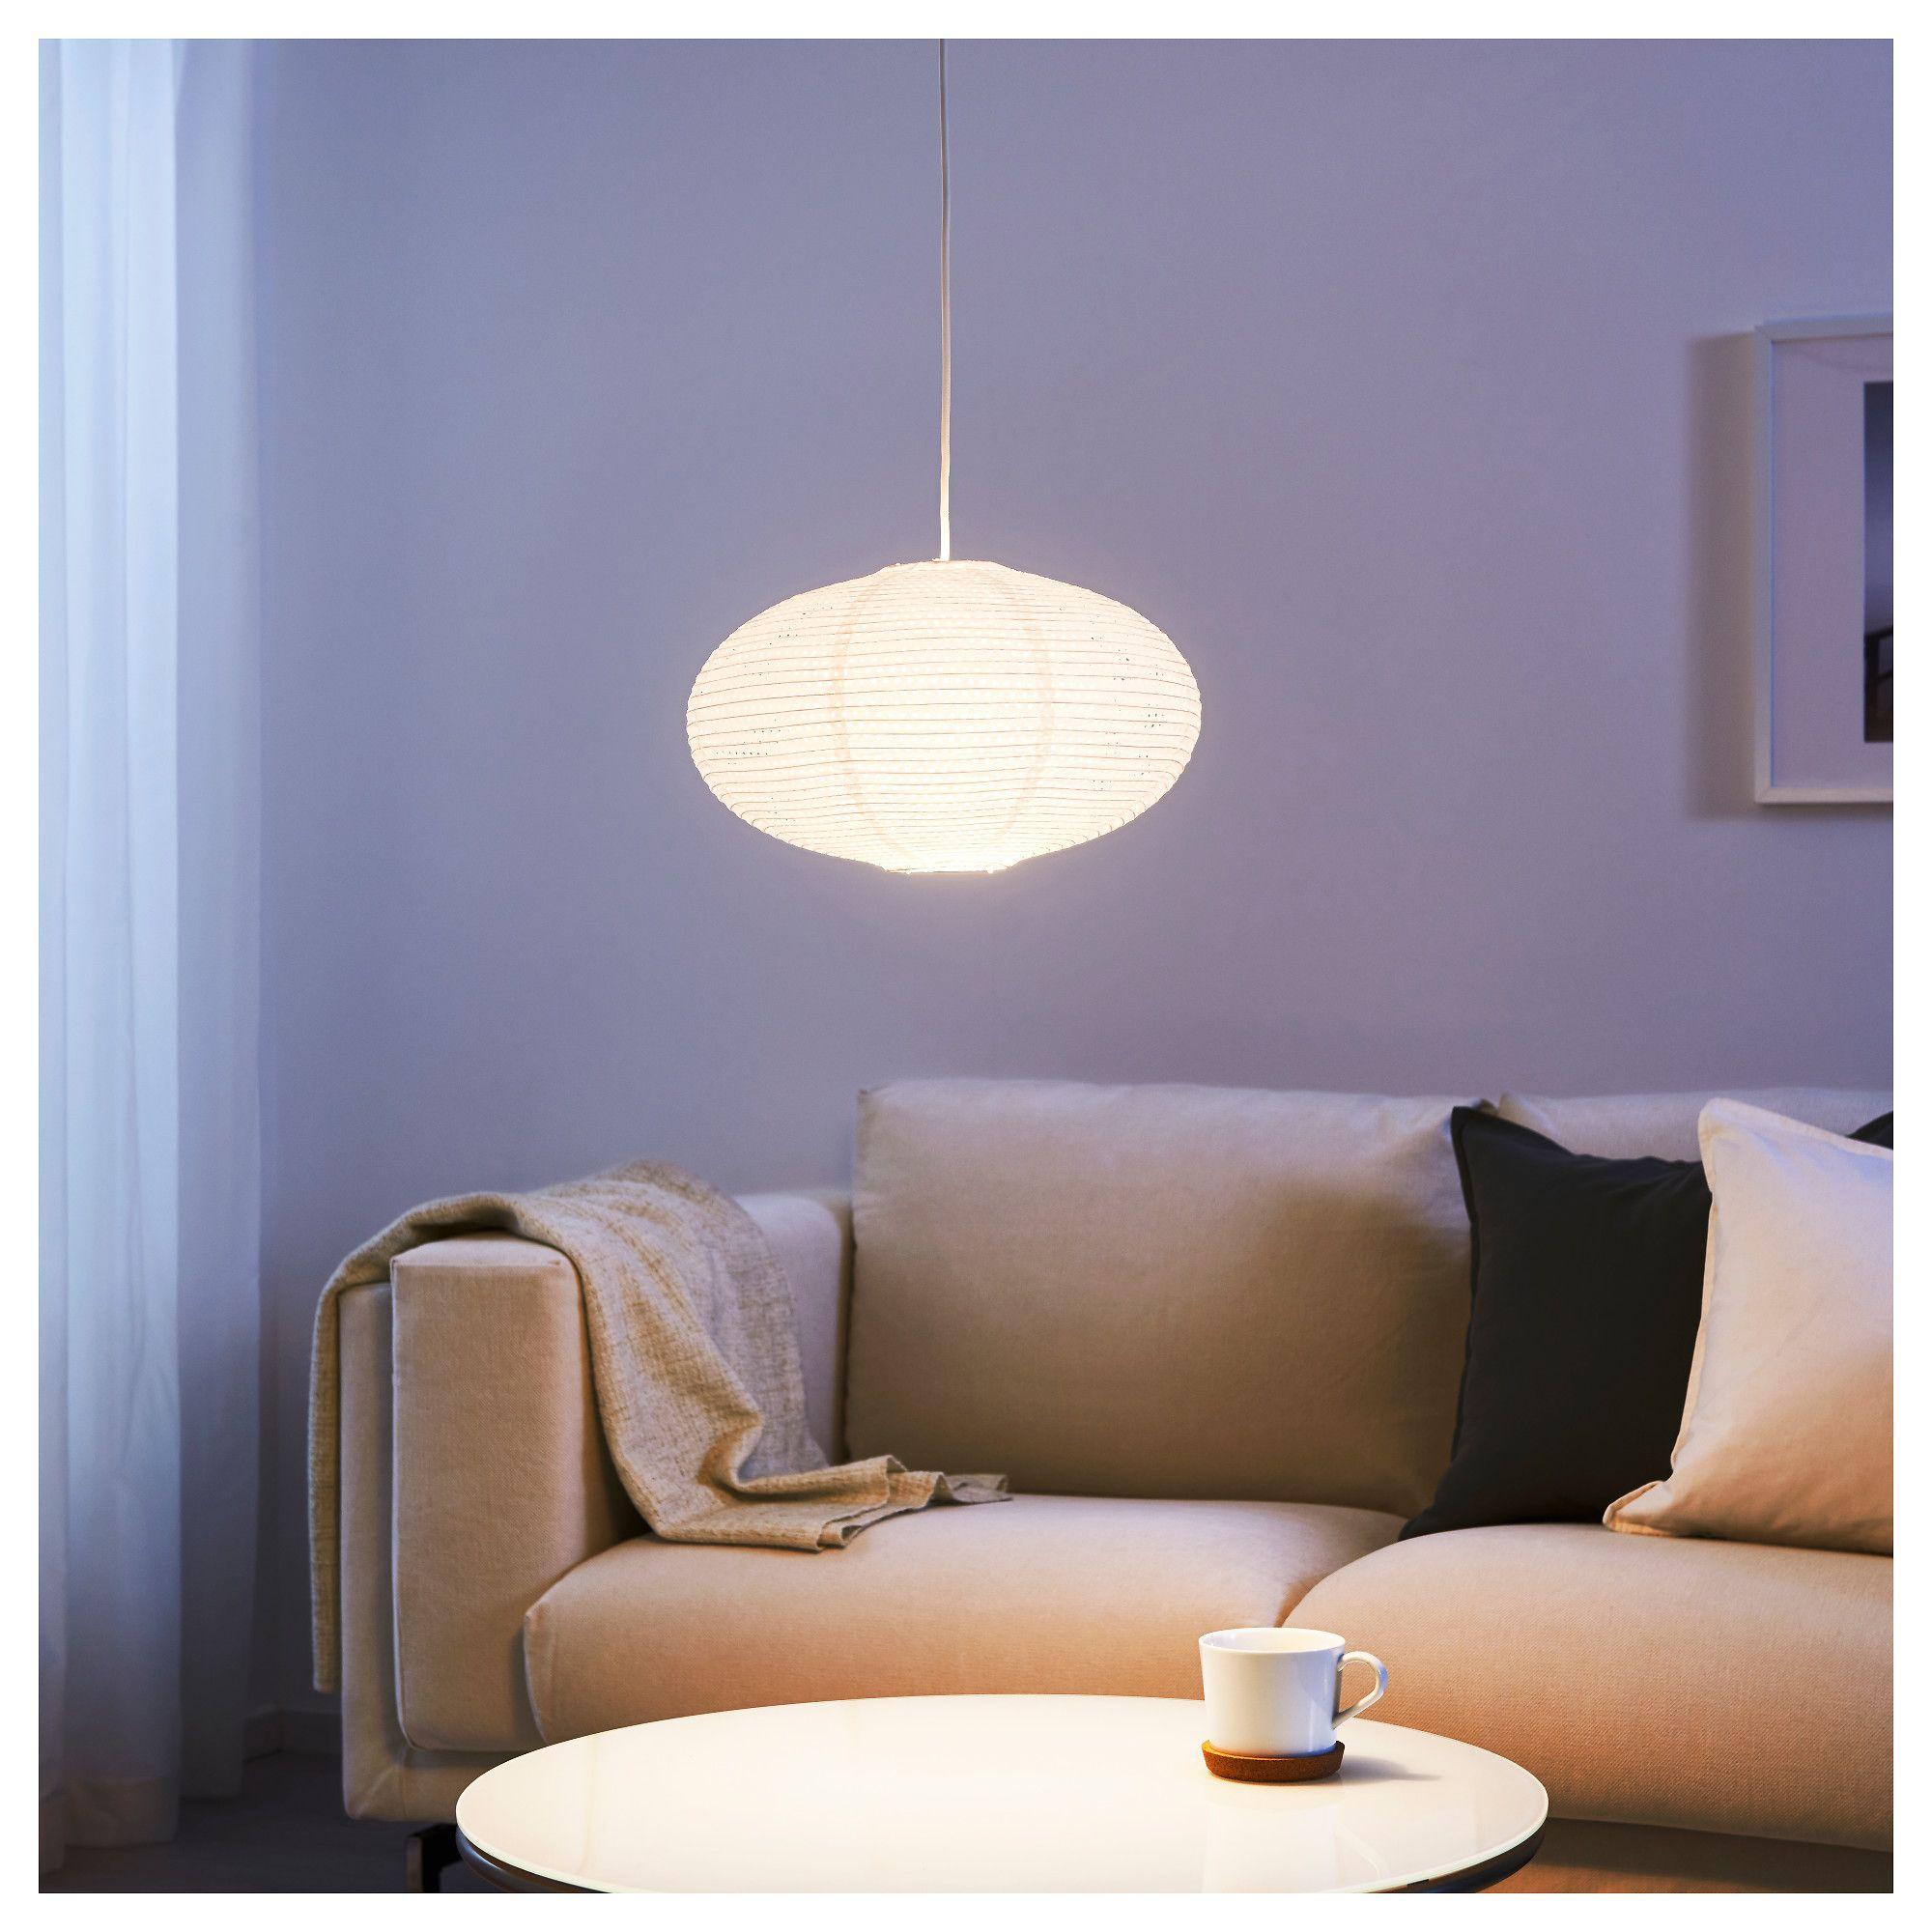 IKEA SOLLEFTEA PENDANT Lamp Shade, Rice